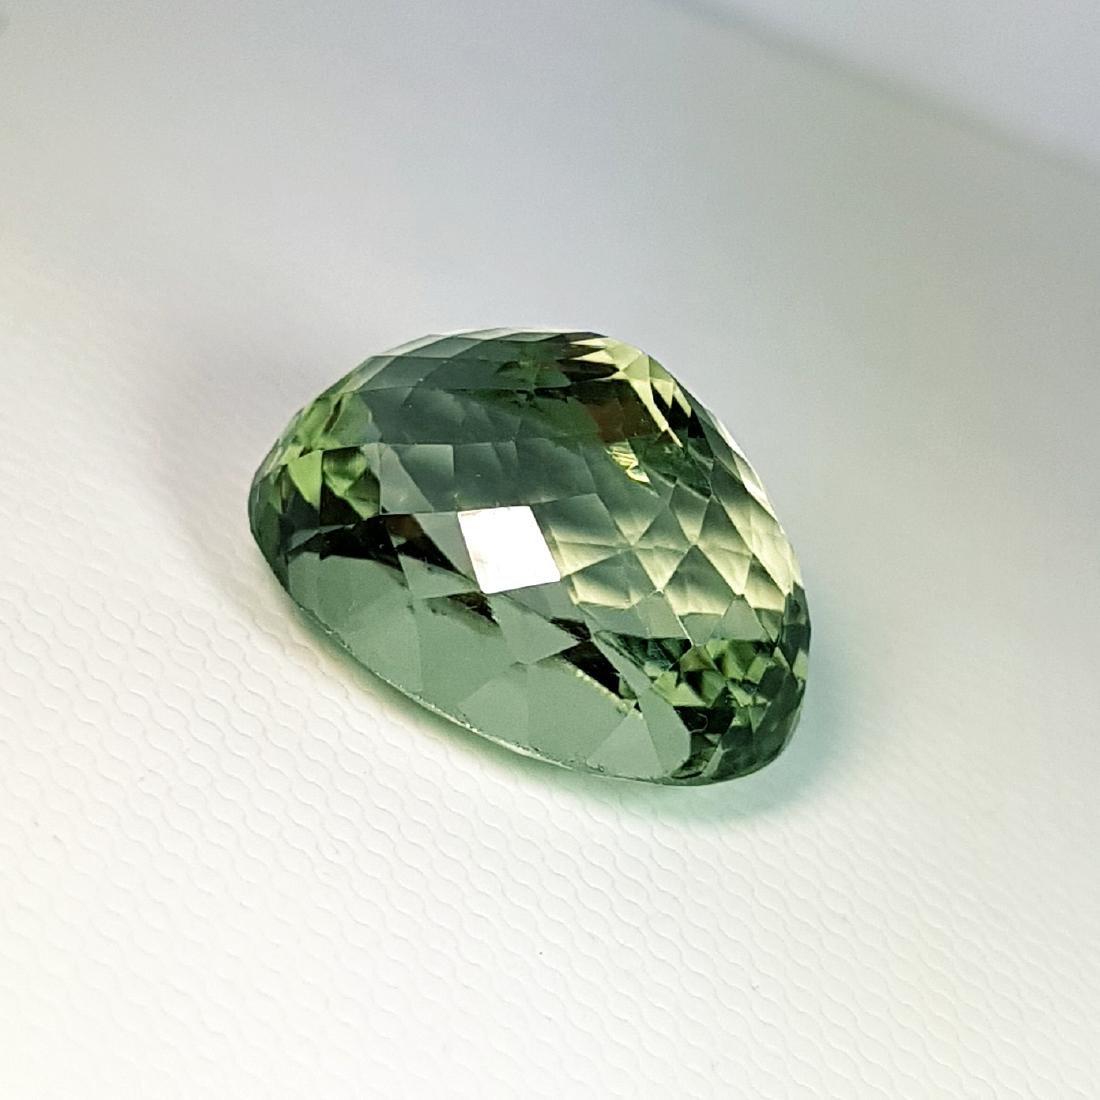 Green Amethyst - 19.22 ct - 4